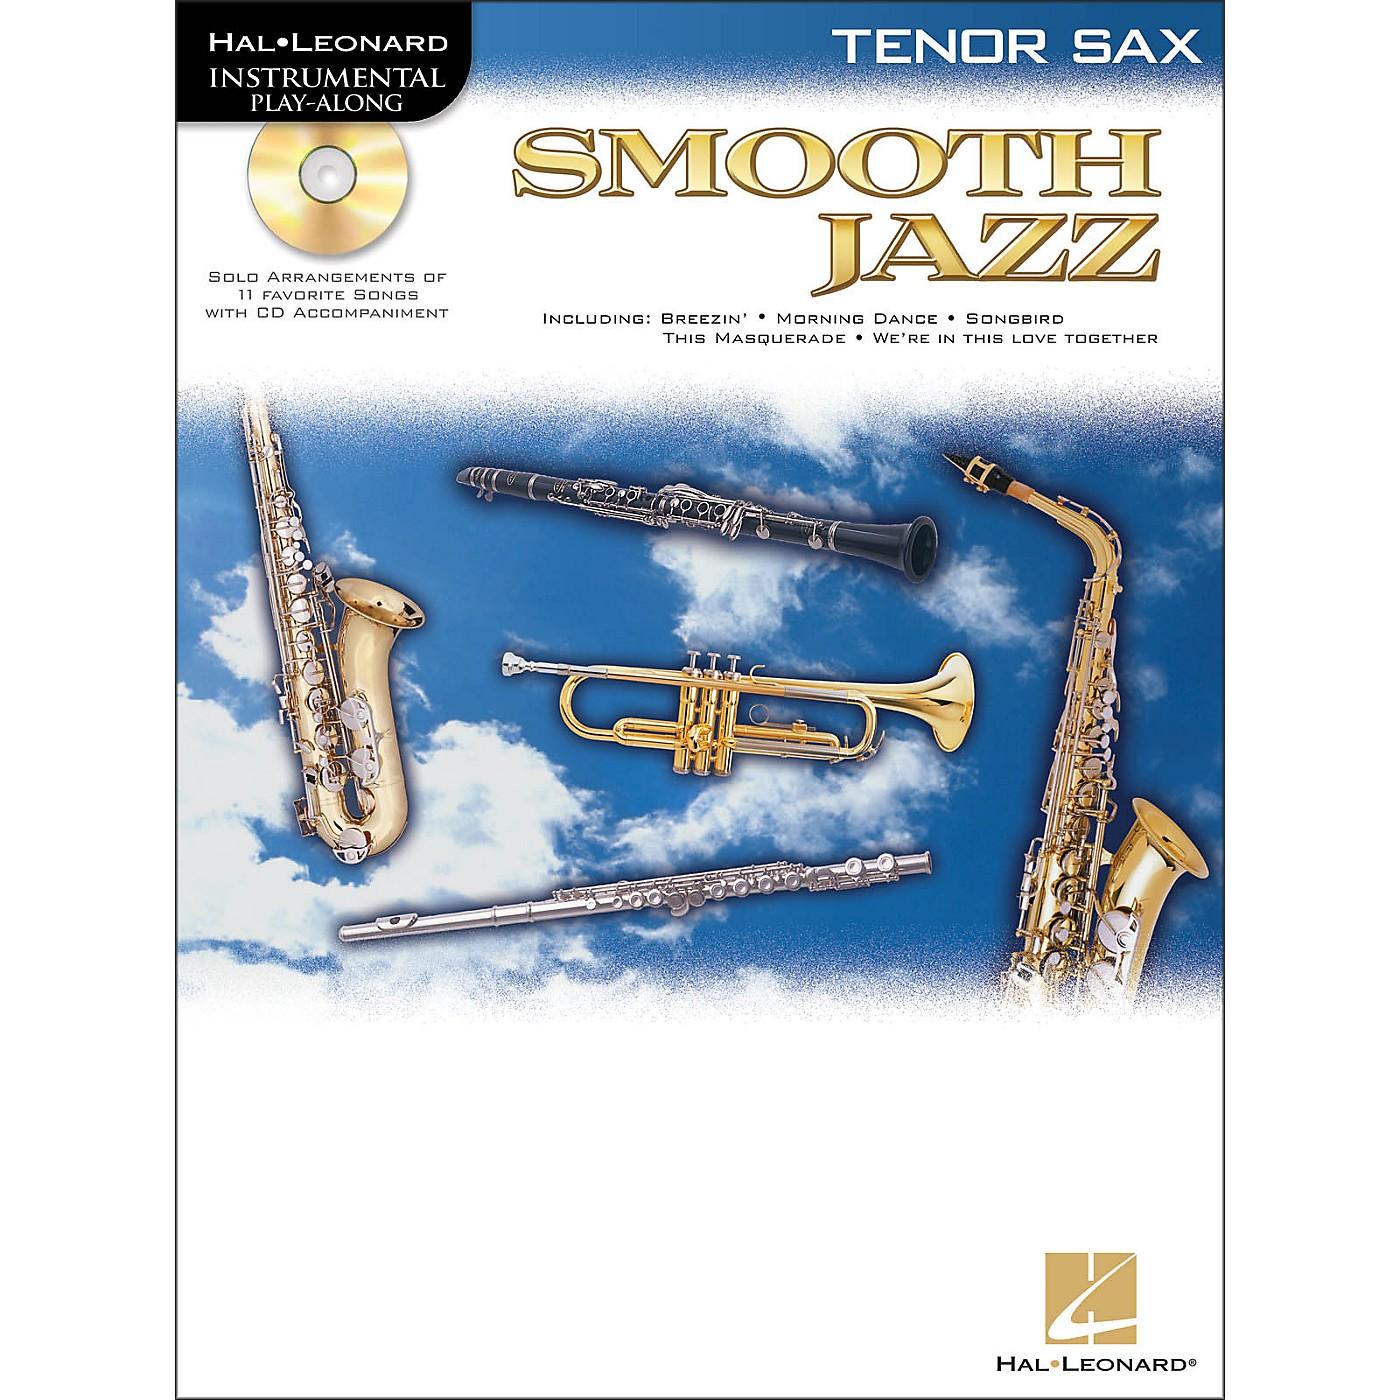 Hal Leonard Smooth Jazz for Tenor Sax Book/CD thumbnail